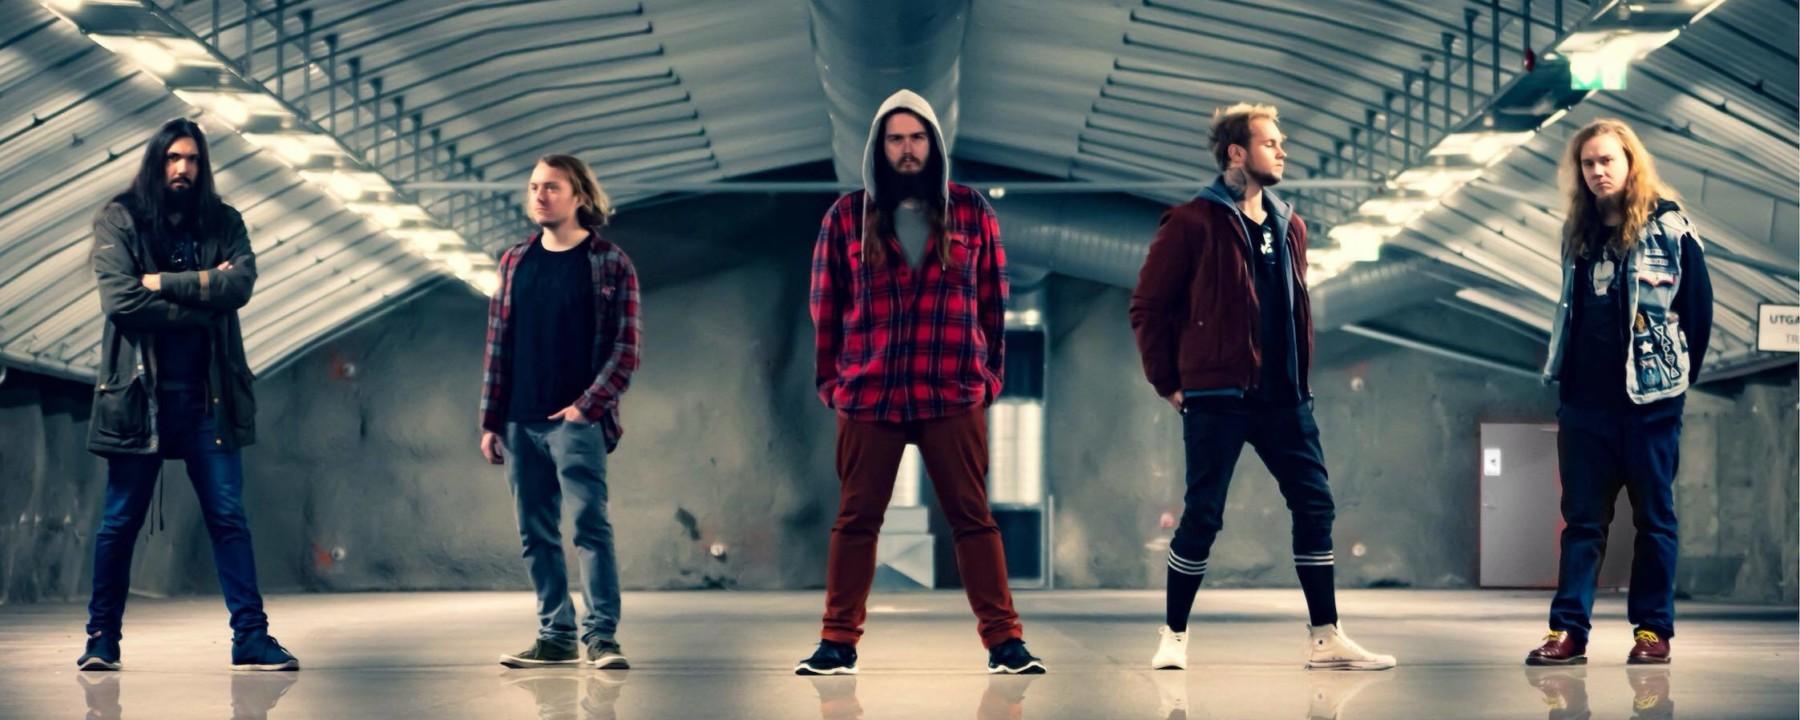 Bilde av bandet Underwing